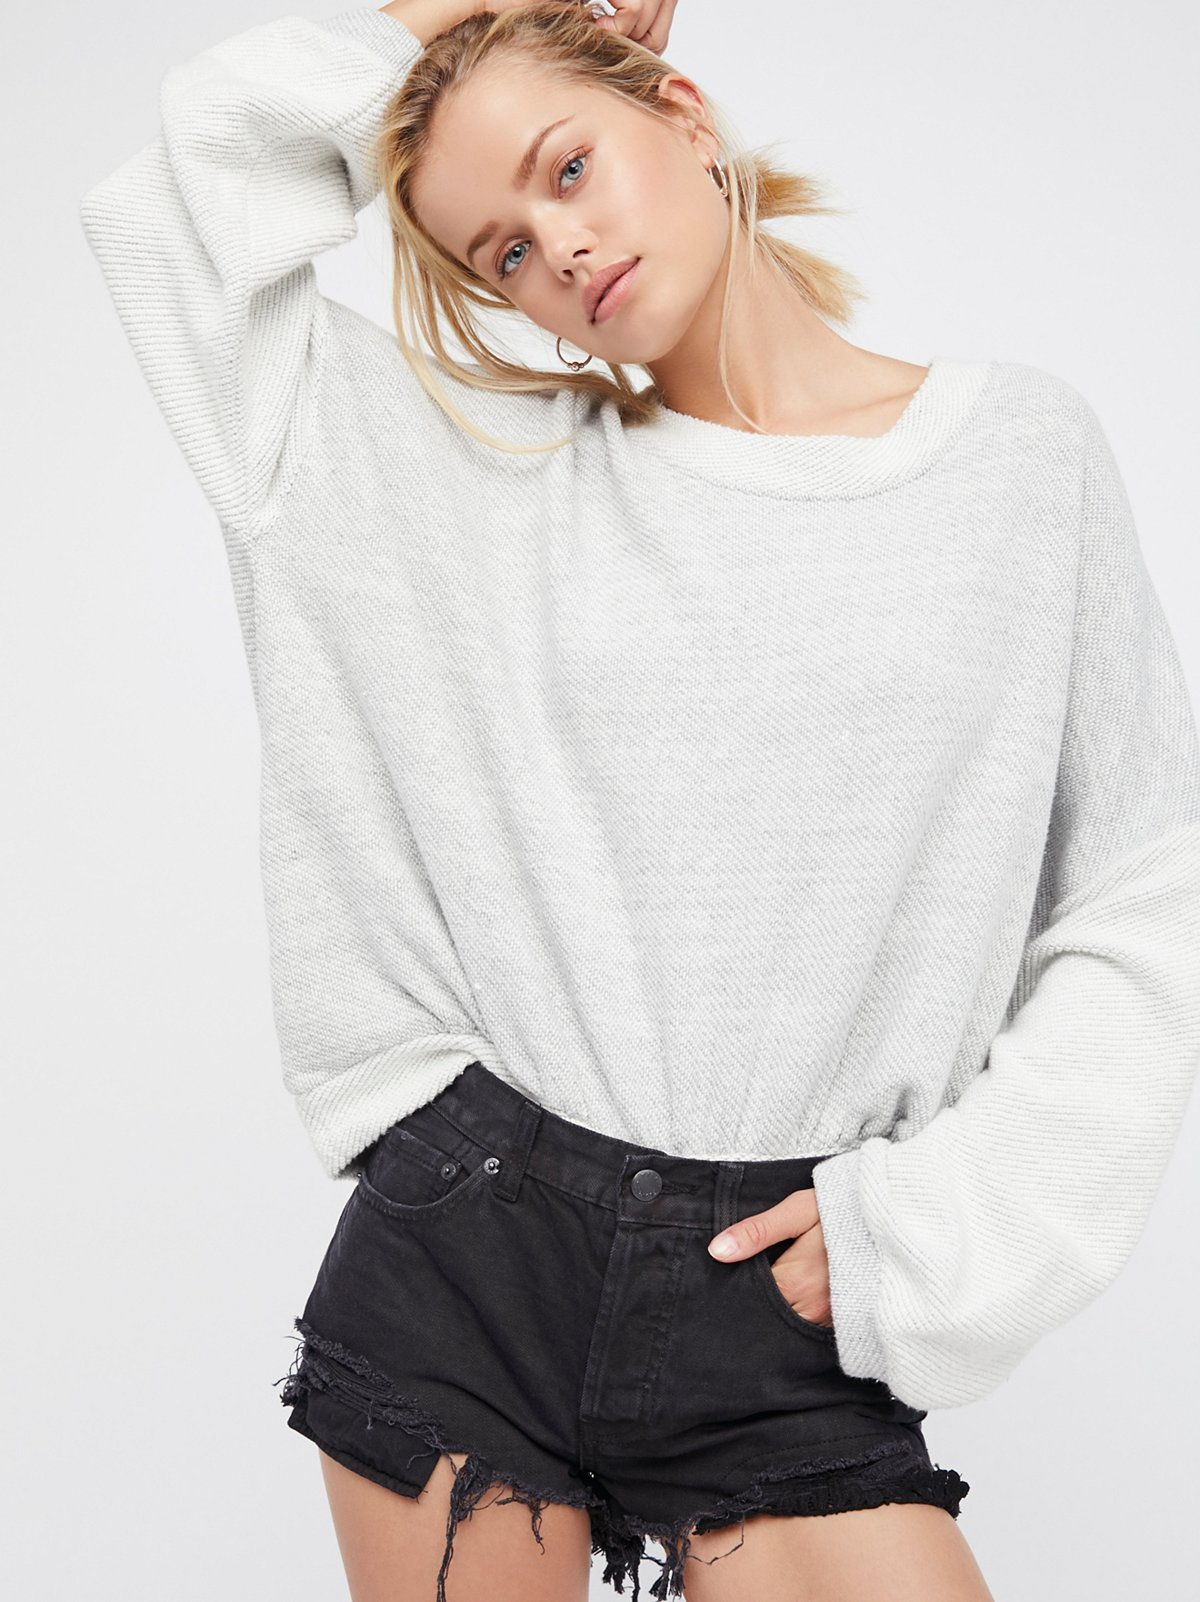 Daisy Chain蕾丝短裤